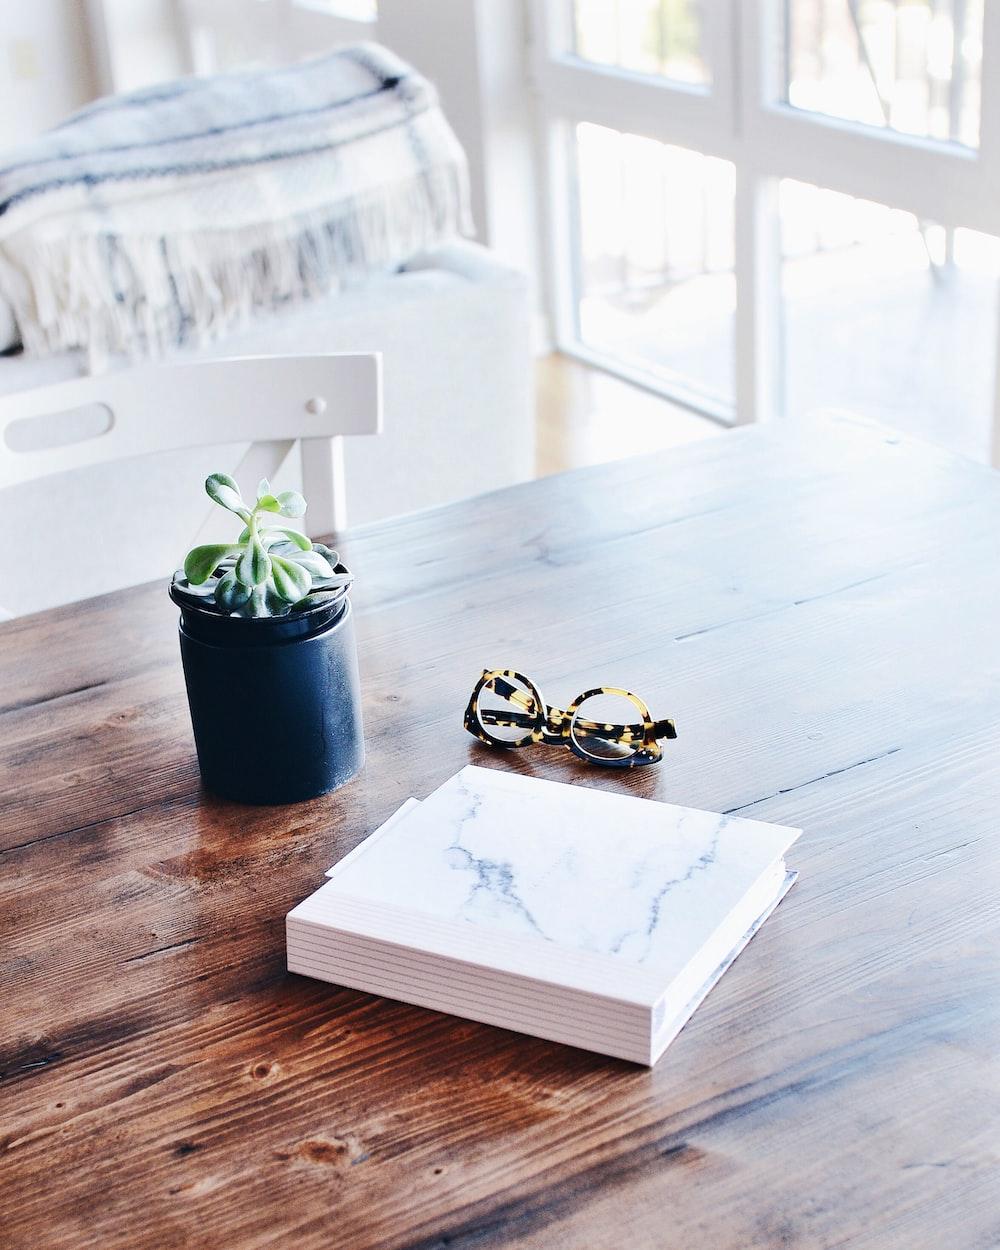 hardbound book beside eyeglasses and succulent plant on table inside room